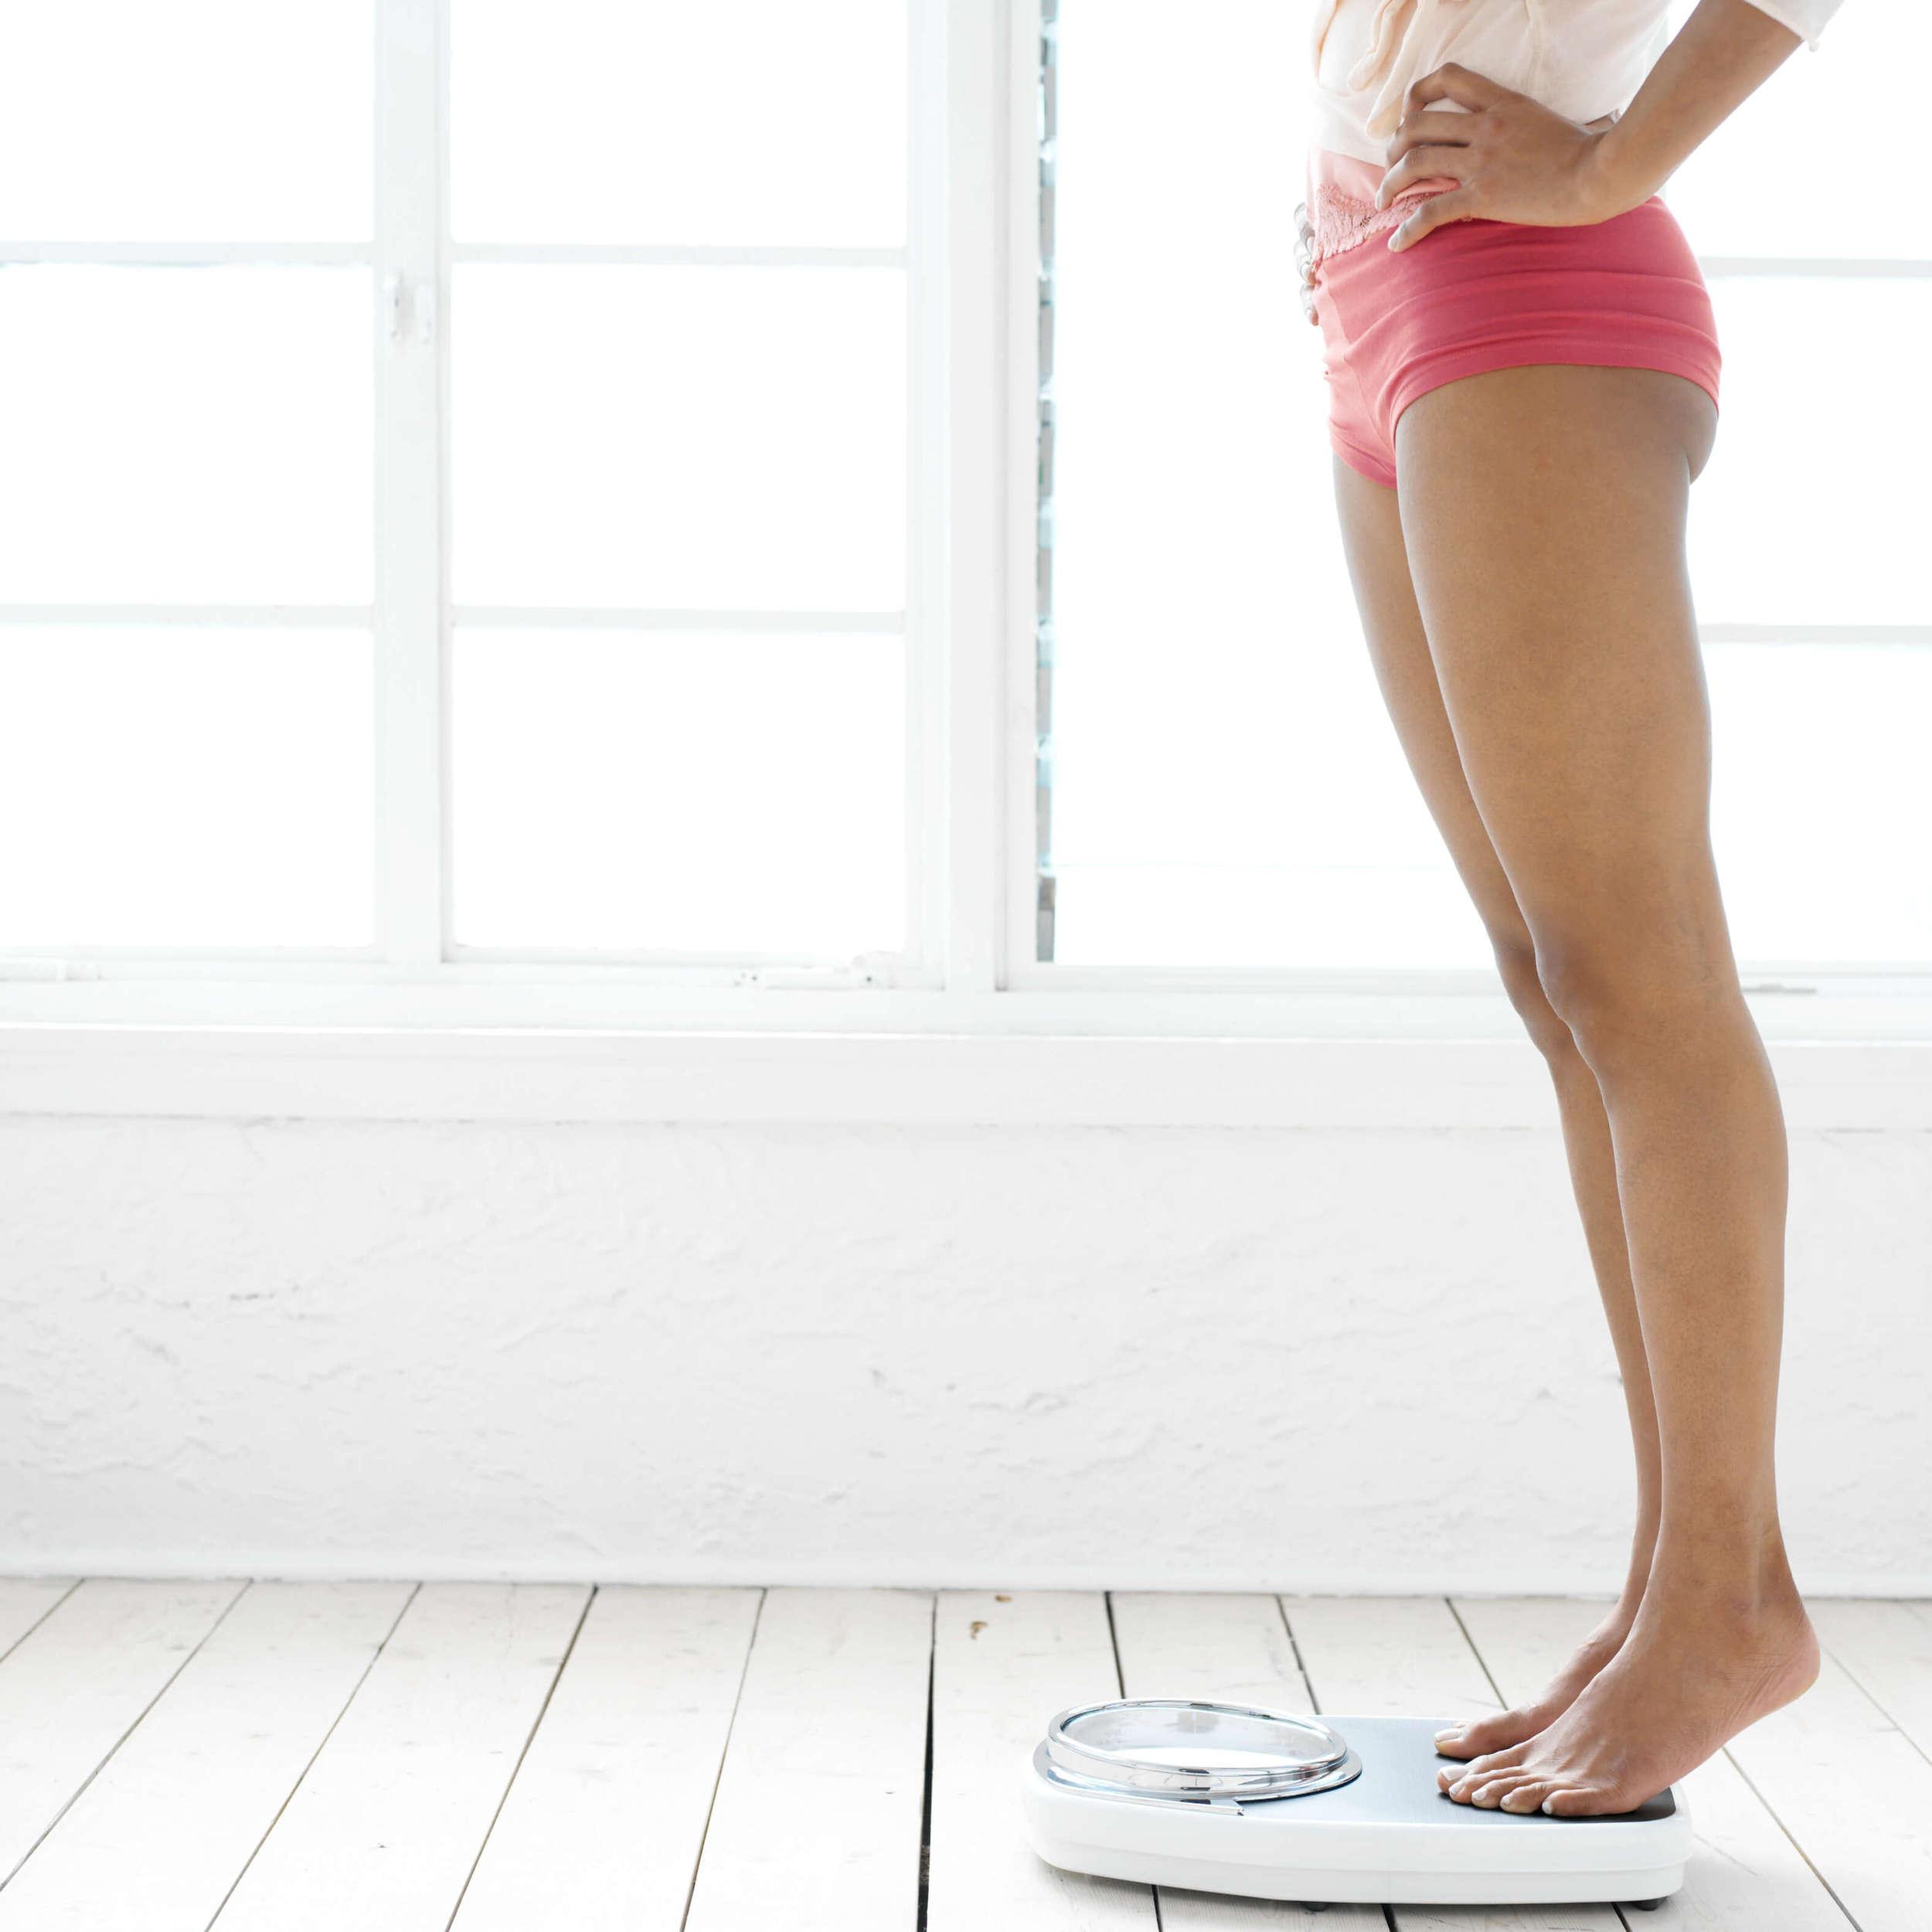 Medarts Weight Loss lipotropic injections San Diego